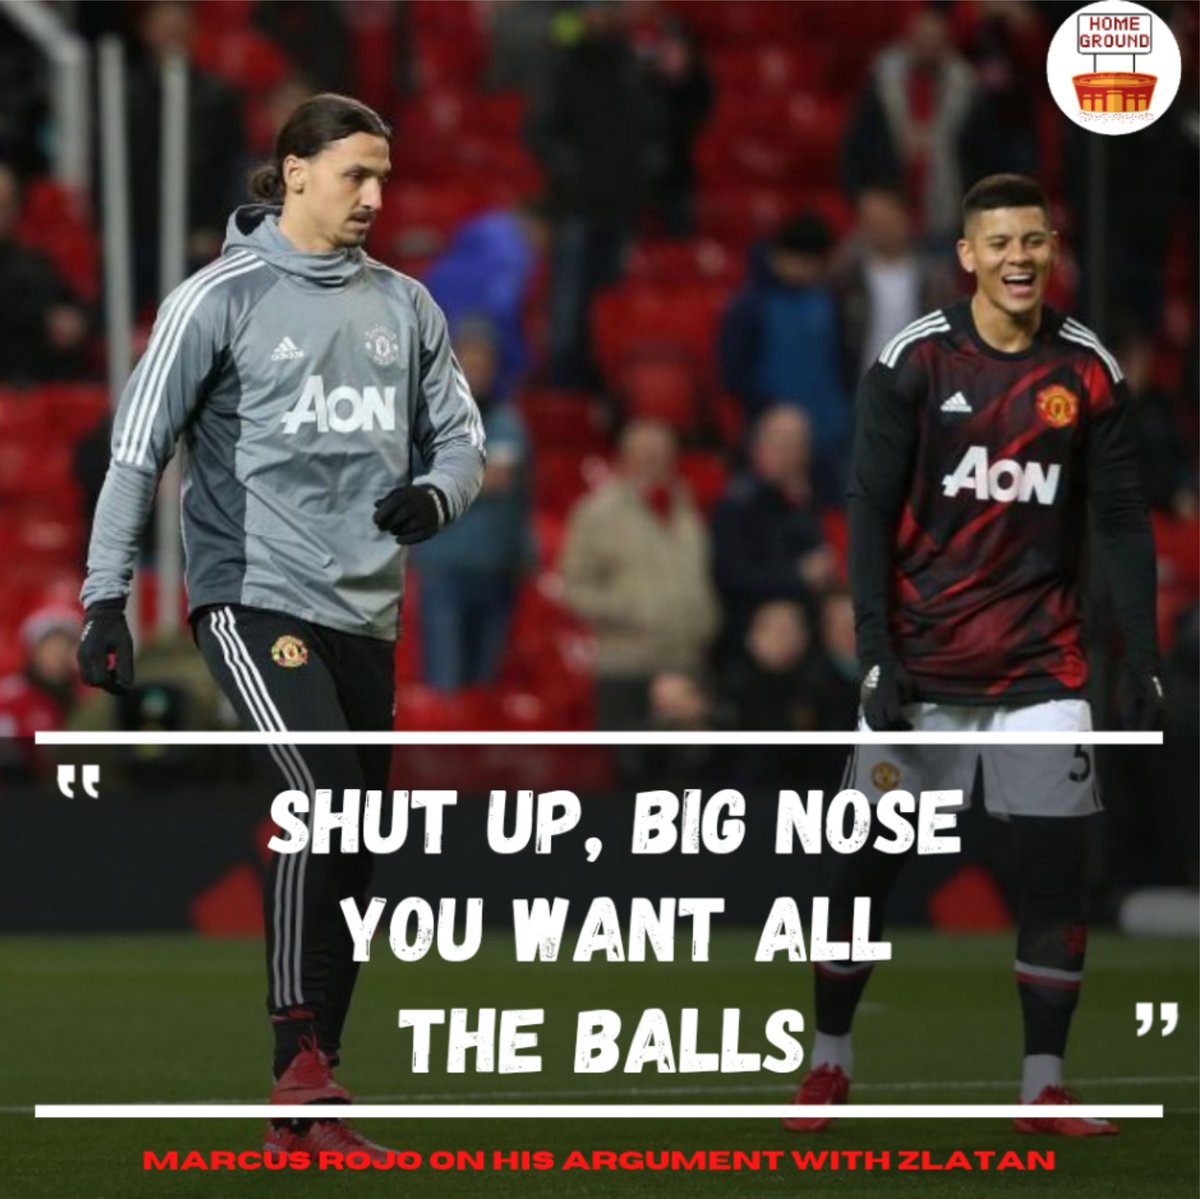 When Manchester United Defender Marcus Rojo decided to fight a Lion.  #manchesterunited #manunited #footballfunny #homeground #insta #soccer #futbol #troll #PL #premierleague #zlatanibrahimovic #zlatanpic.twitter.com/1Kykrp71Ul